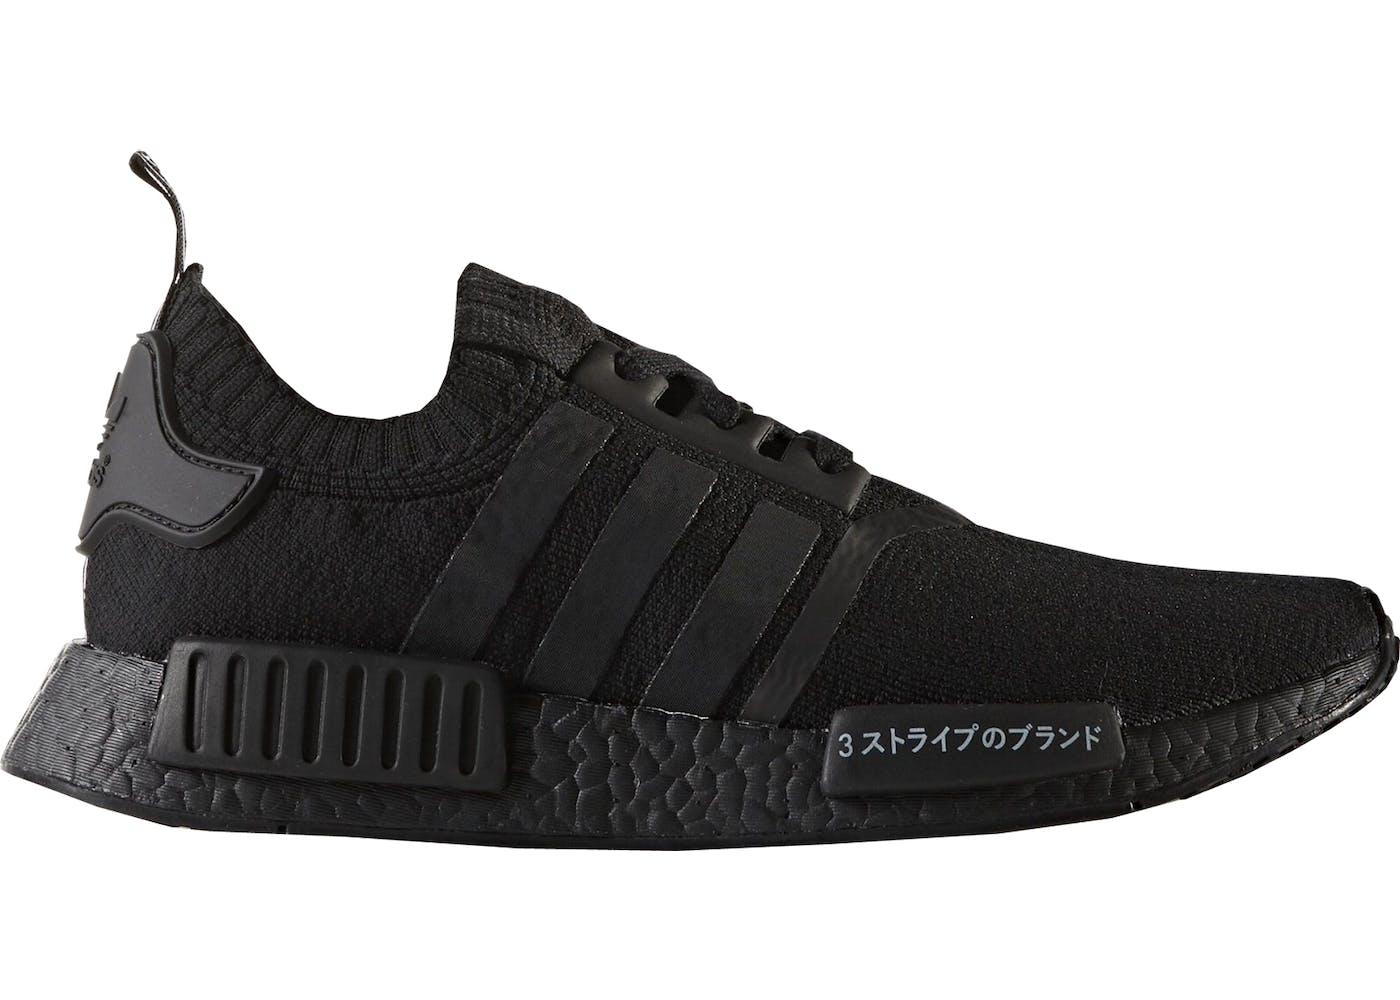 adidas nmd r1 all black